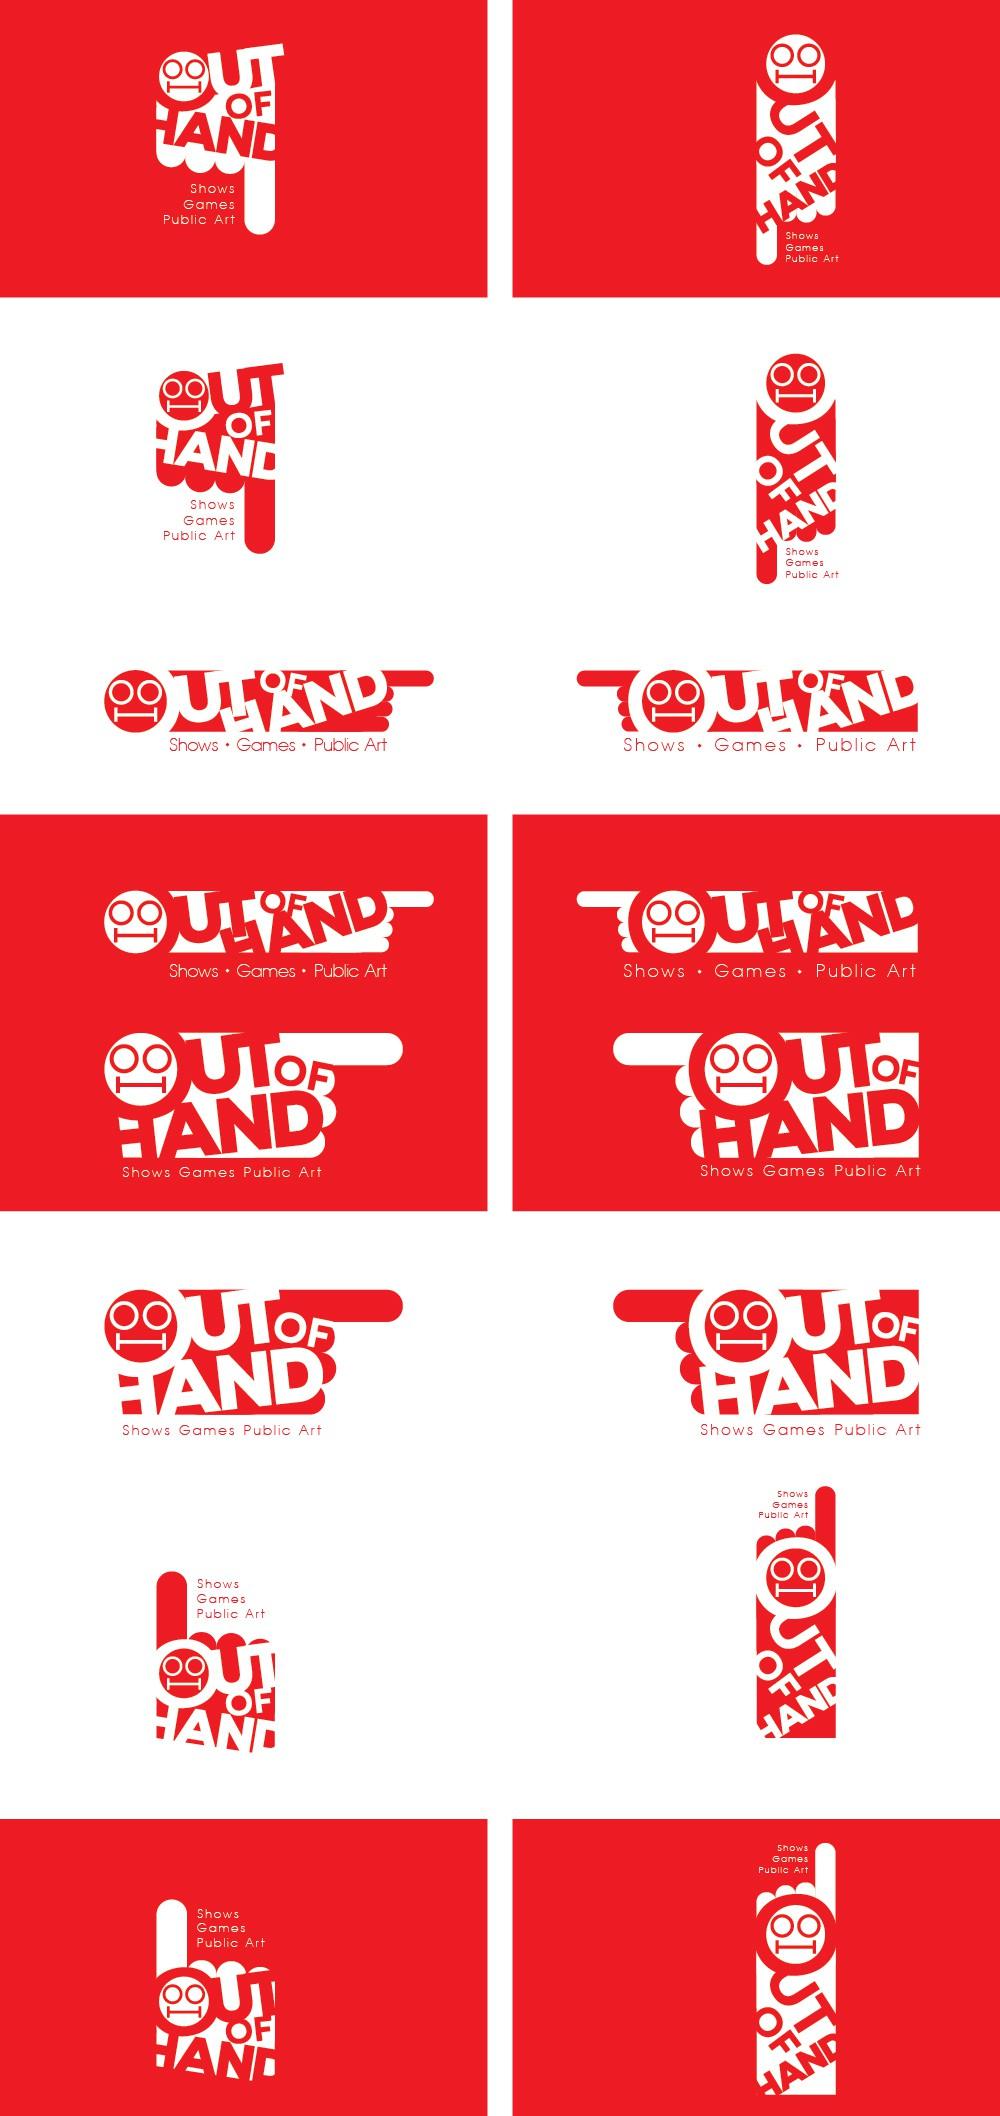 Update logo design for an innovative arts organization